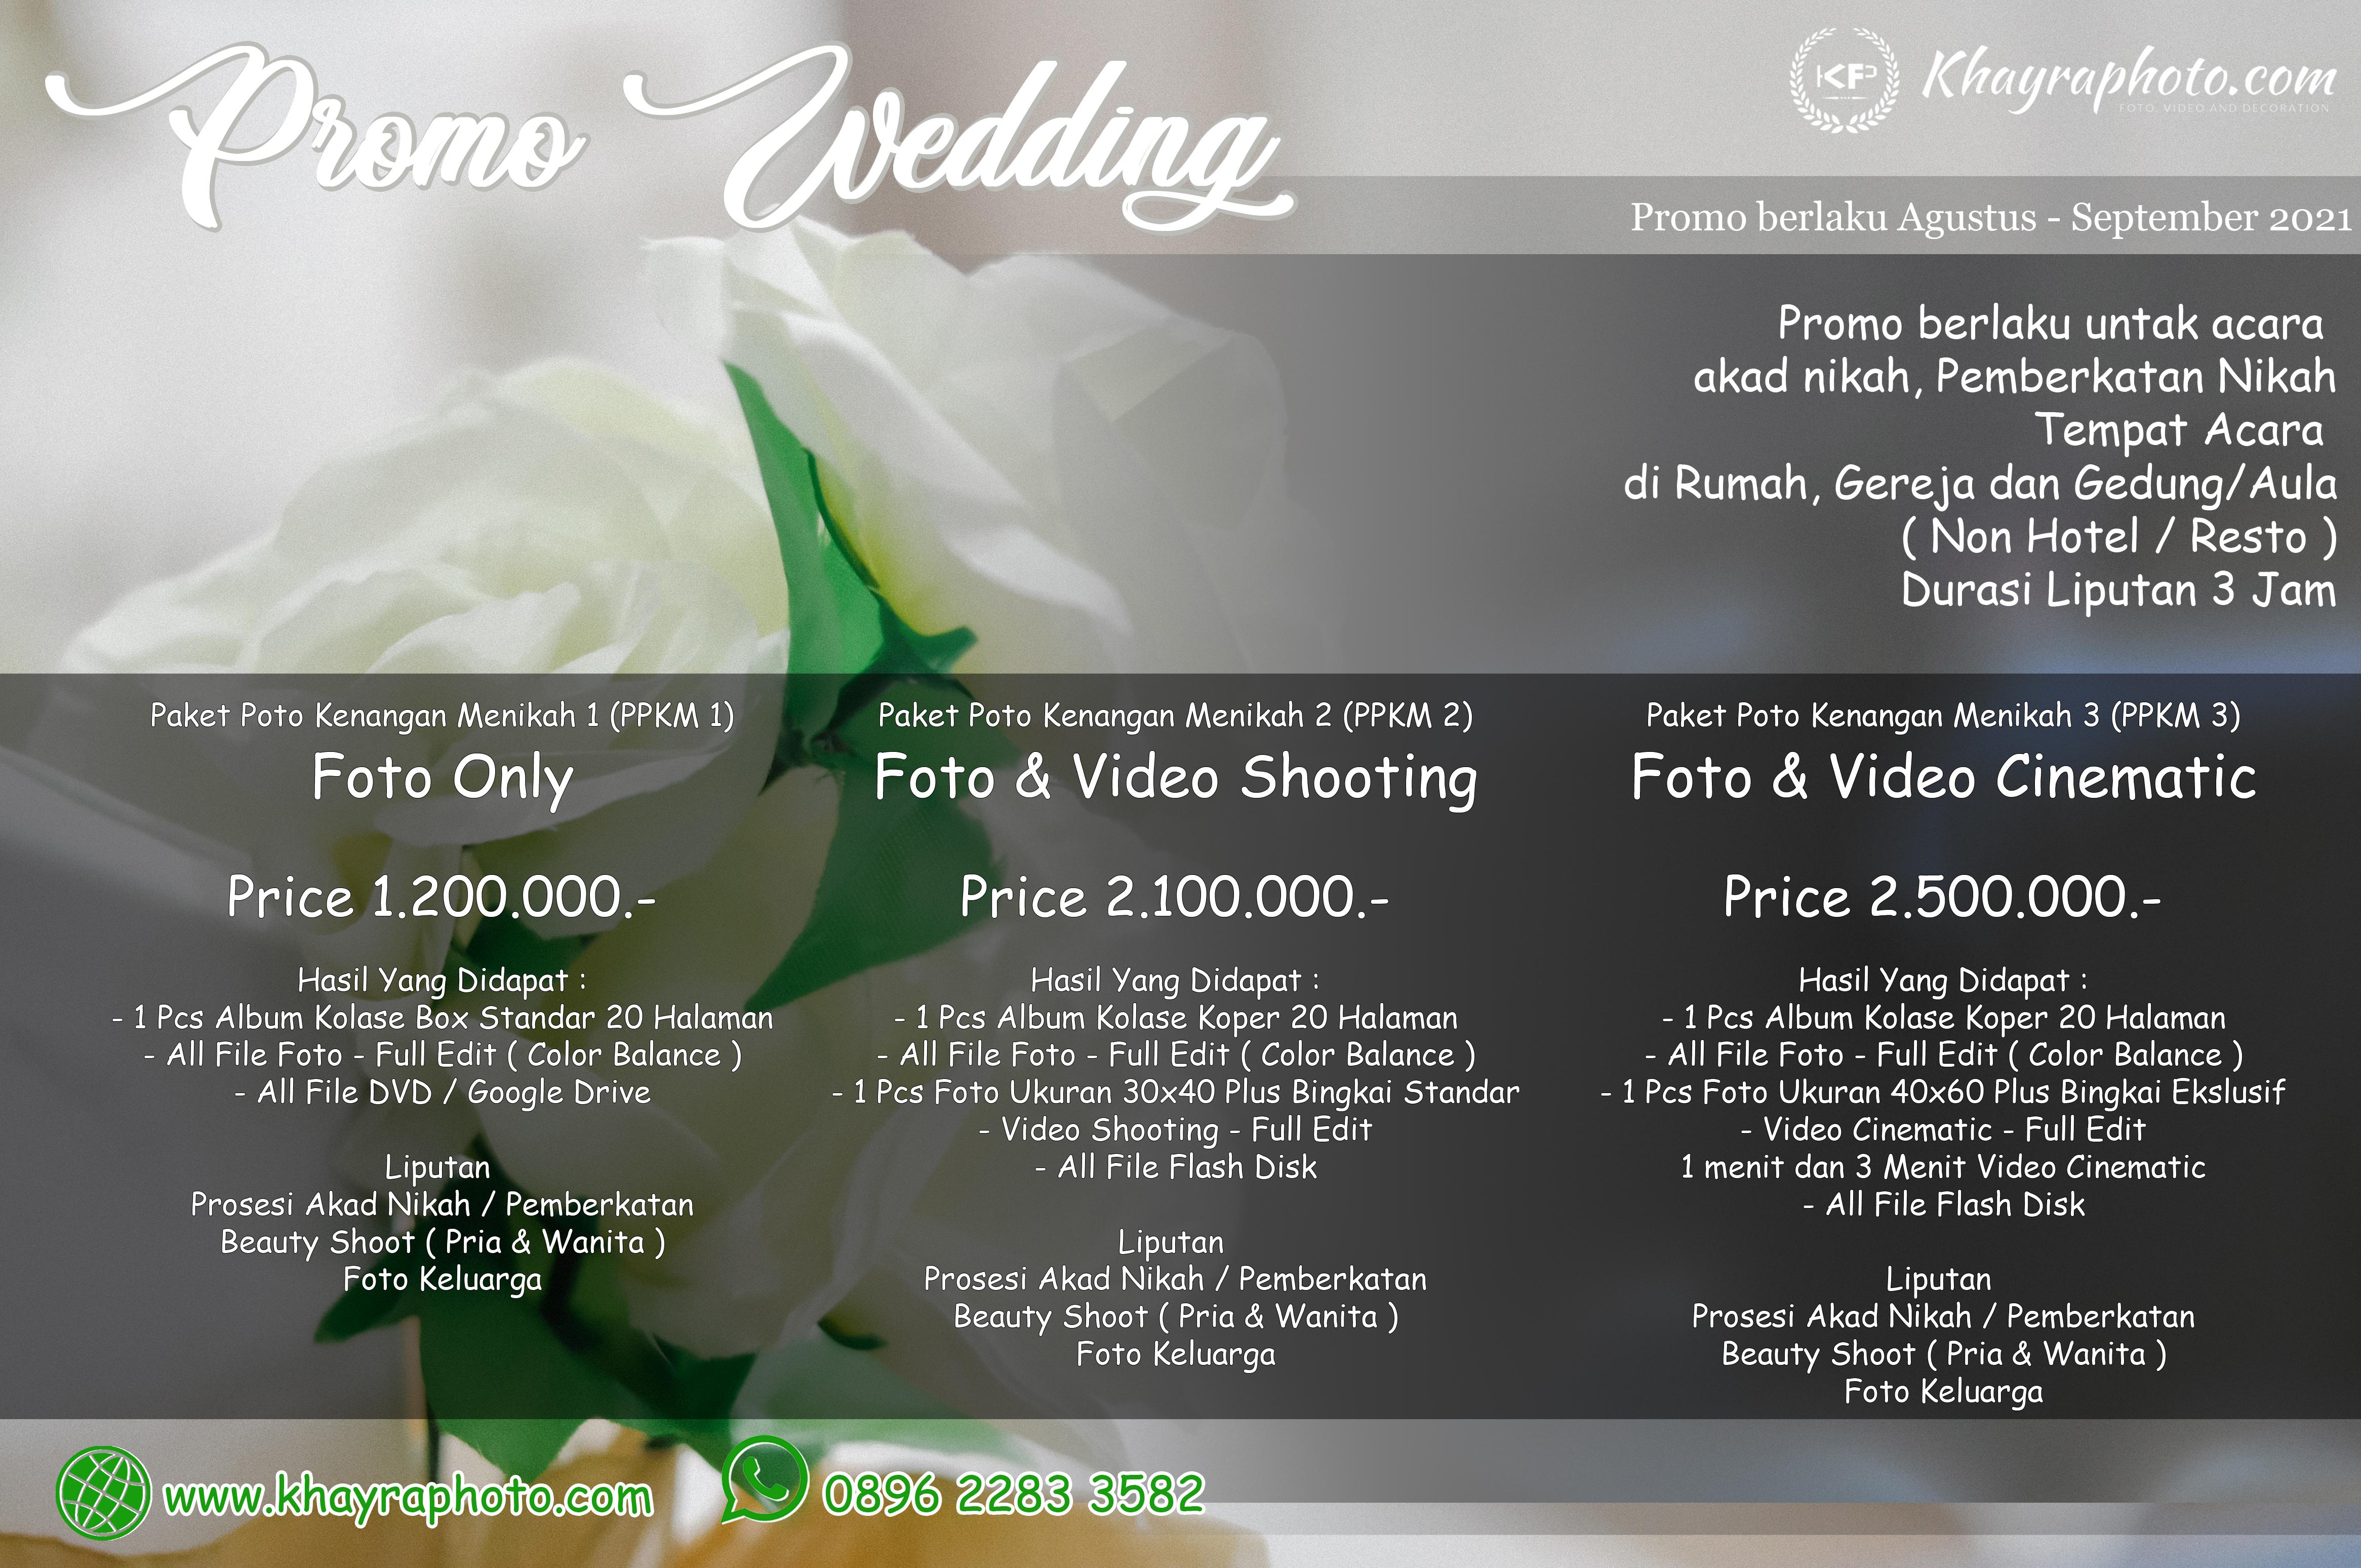 Promo Wedding agustus - september 2021